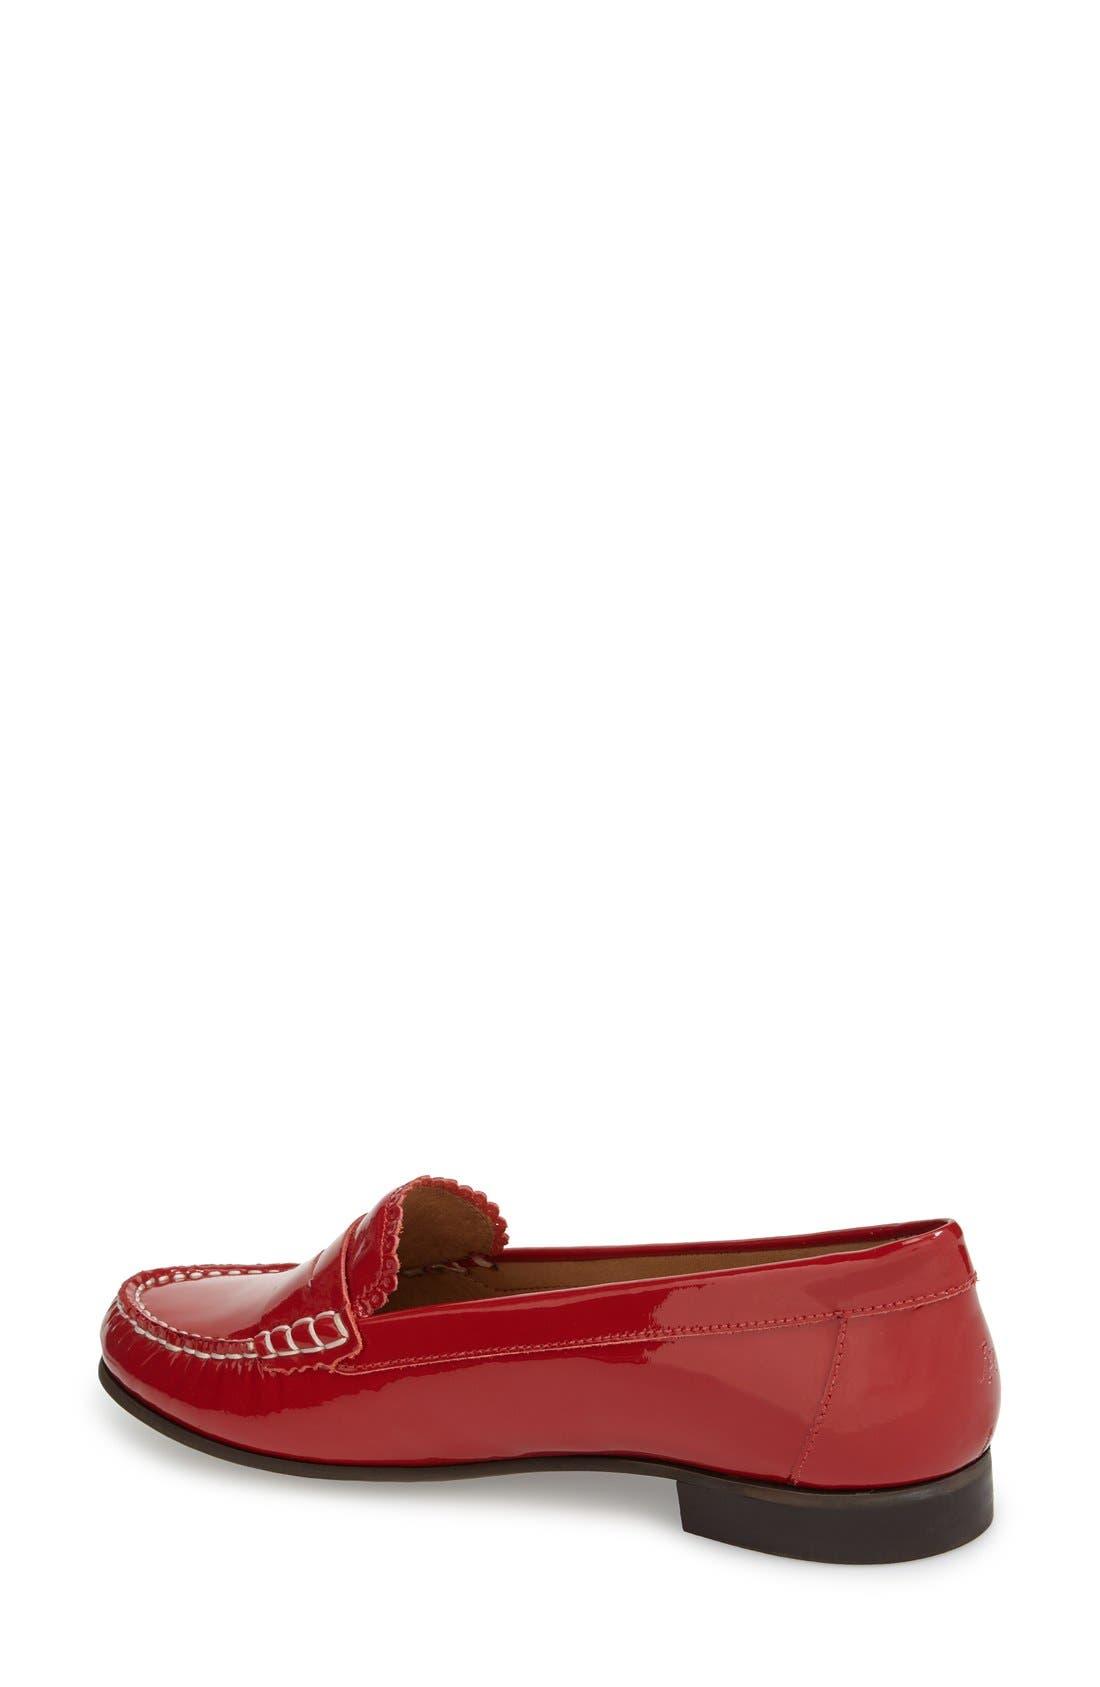 'Quinn' Leather Loafer,                             Alternate thumbnail 12, color,